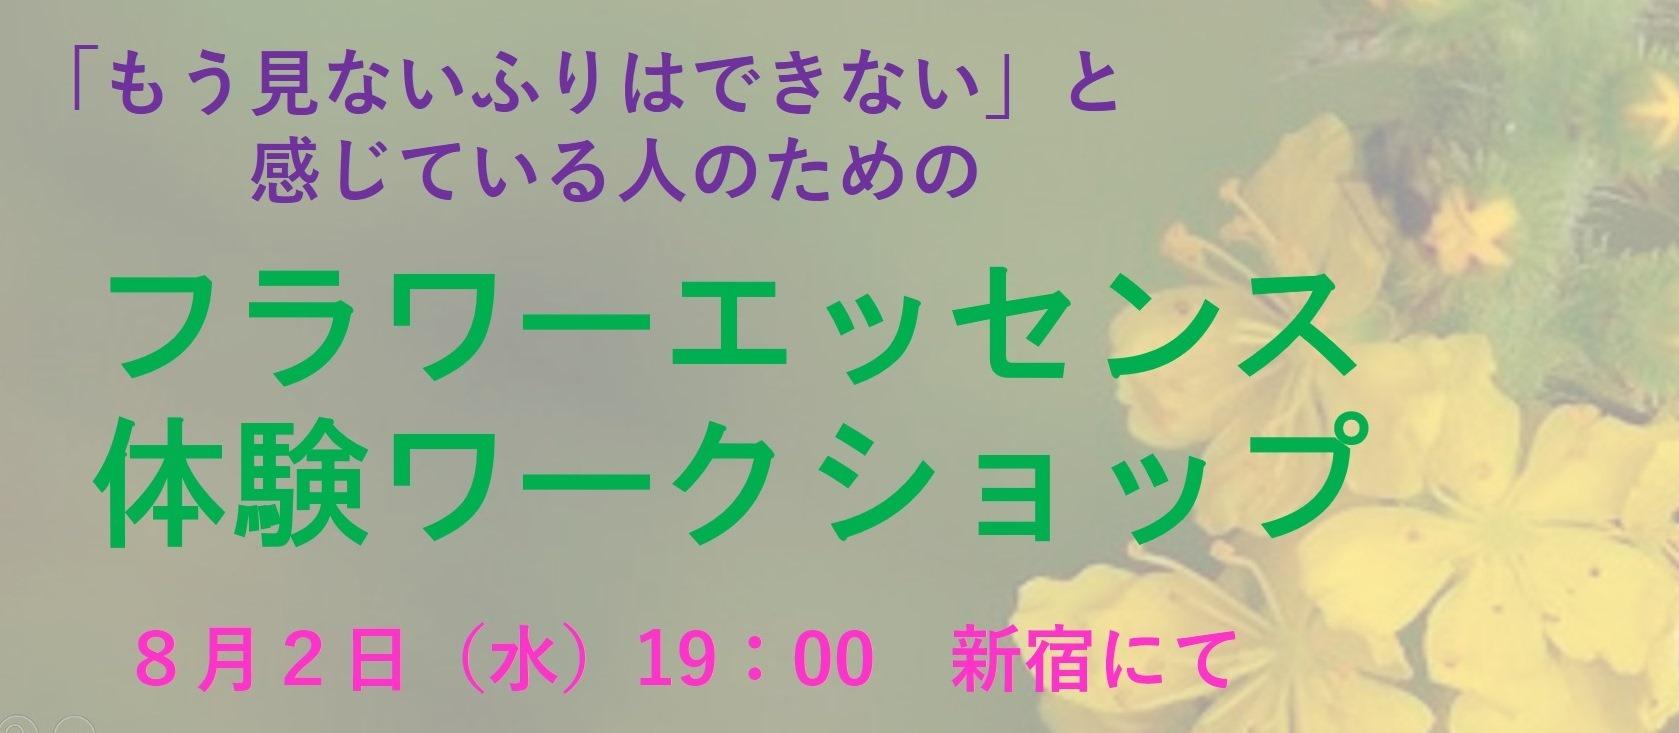 Aug2_photo.jpg